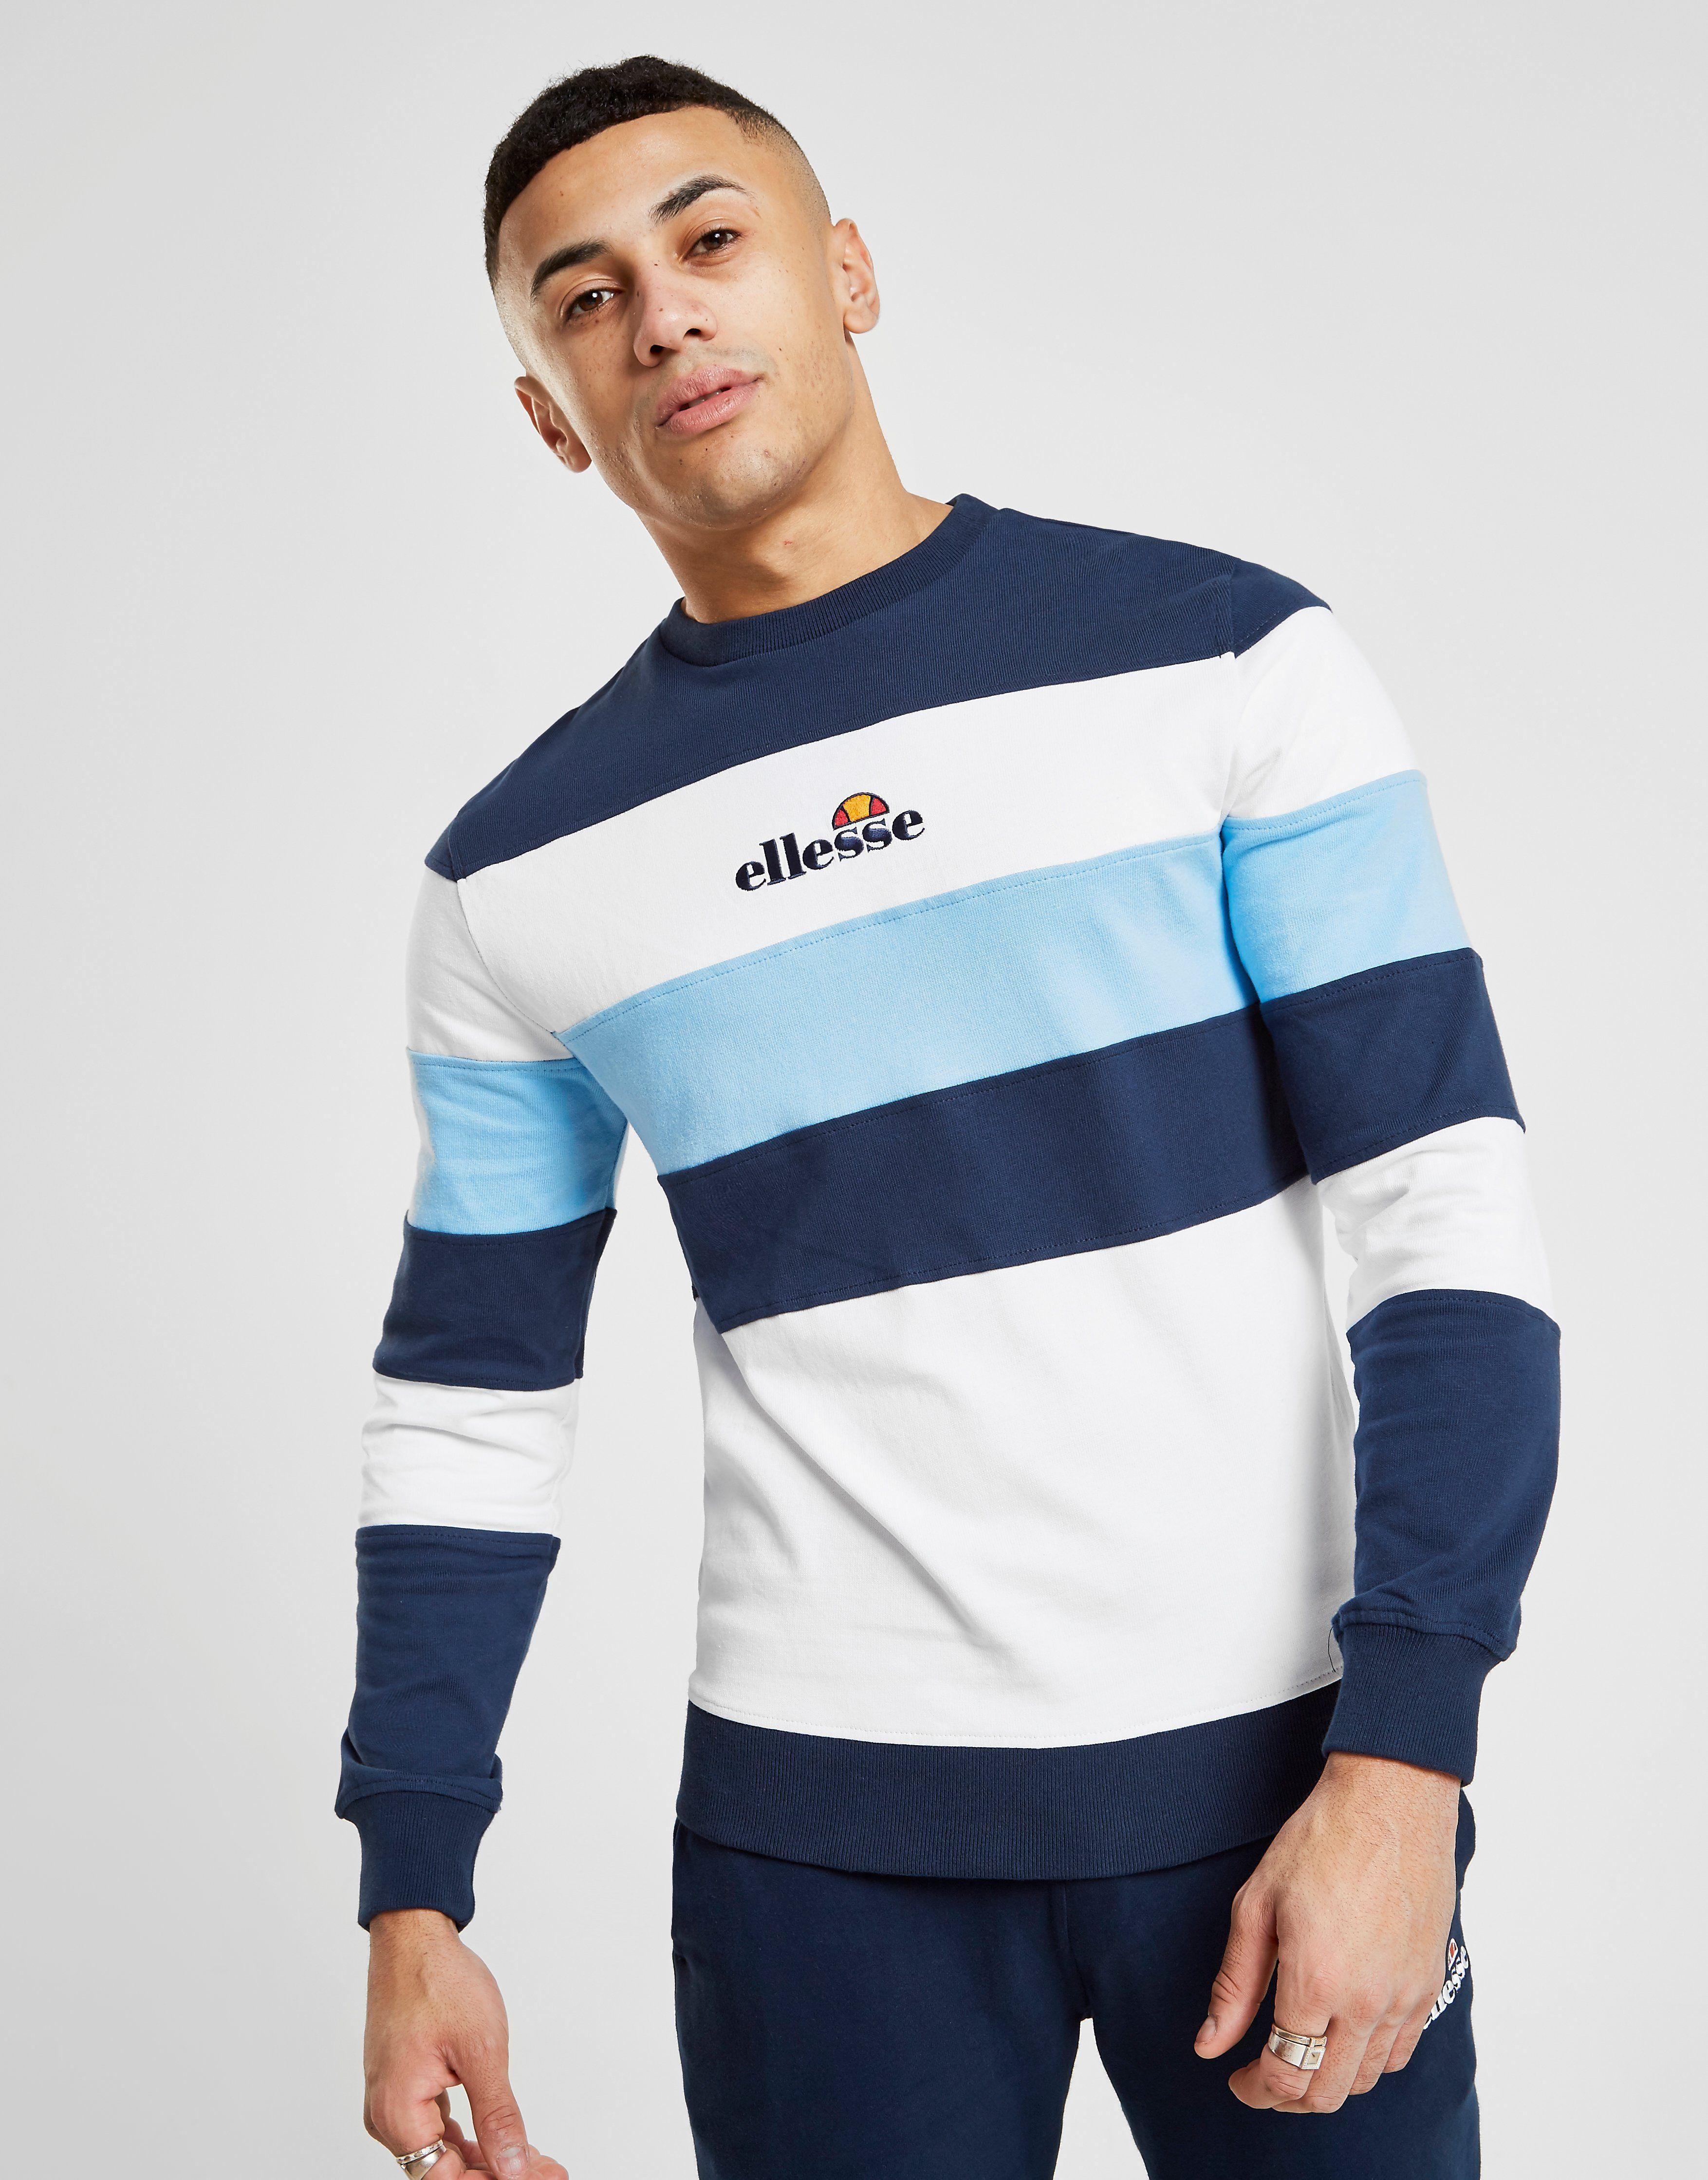 Ellesse Metallia French Terry Crew Sweatshirt